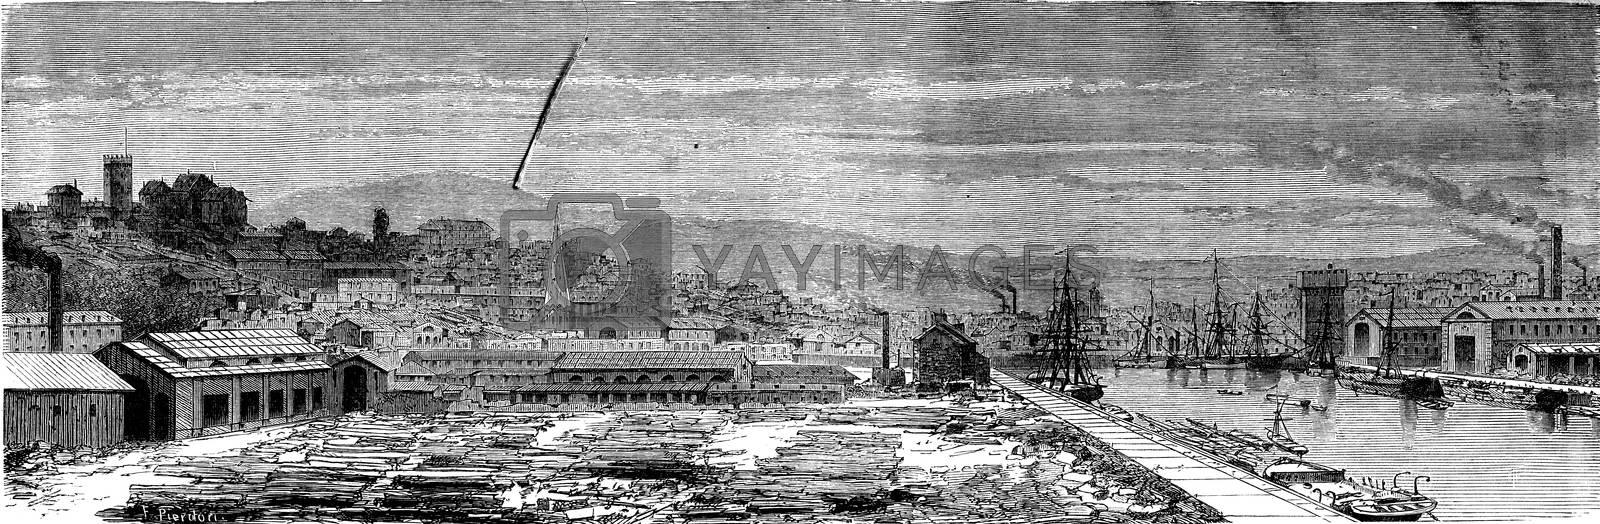 View of Newport, vintage engraved illustration. Le Tour du Monde, Travel Journal, (1865).